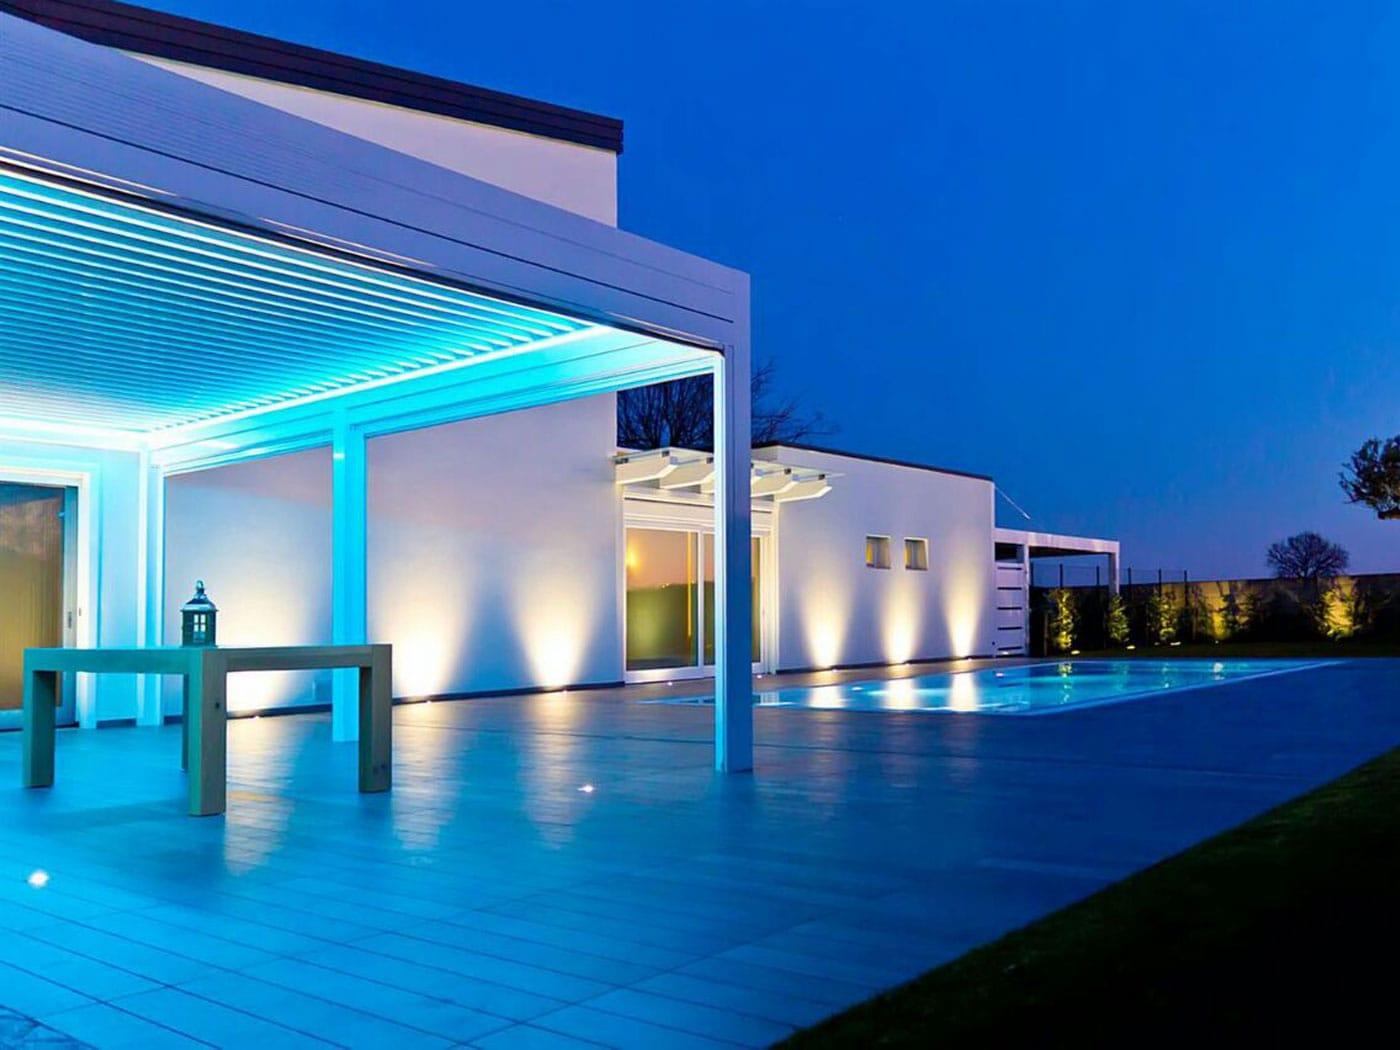 Villa con piscina zoppelletto srl - Villa con piscina milano ...